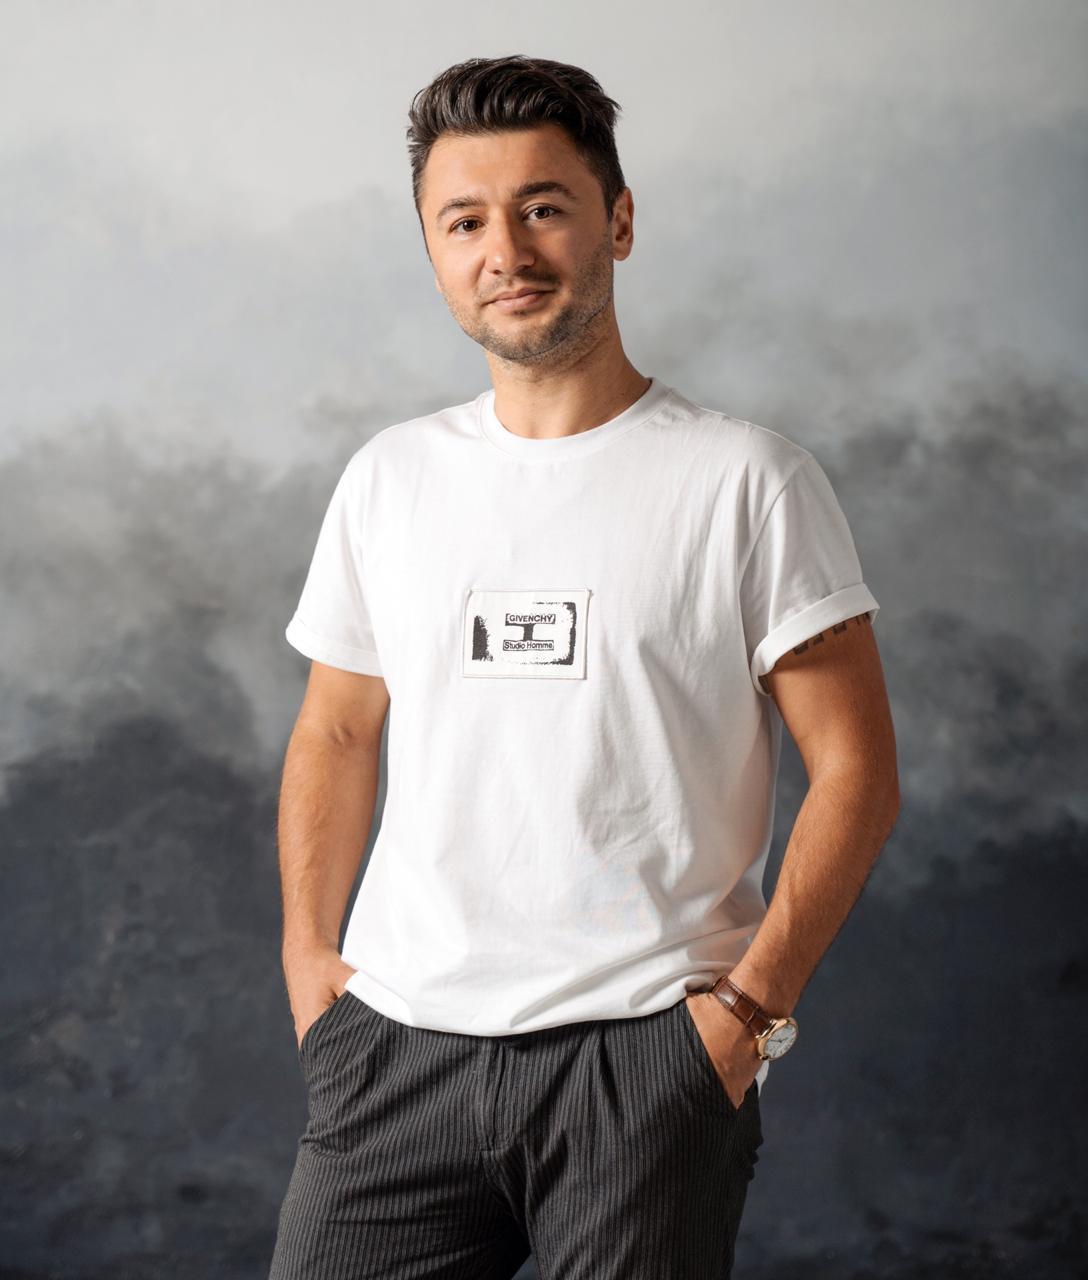 Иван Сорокин, совладелец сети домашних детских садов